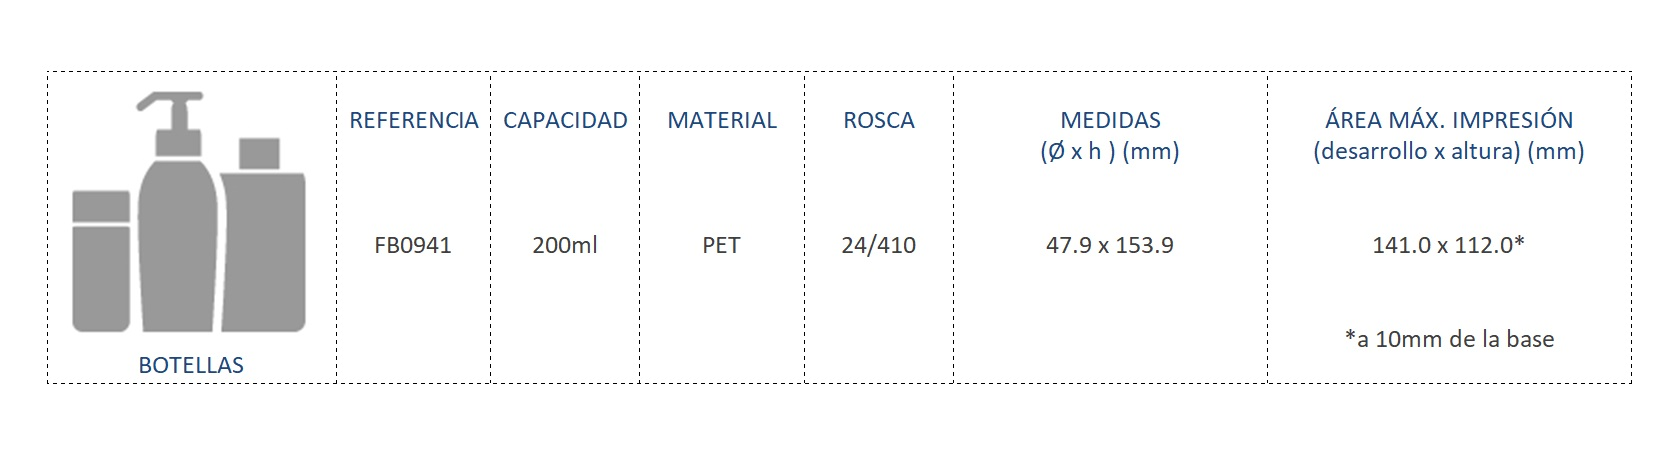 Cuadro de materiales botella FB0941